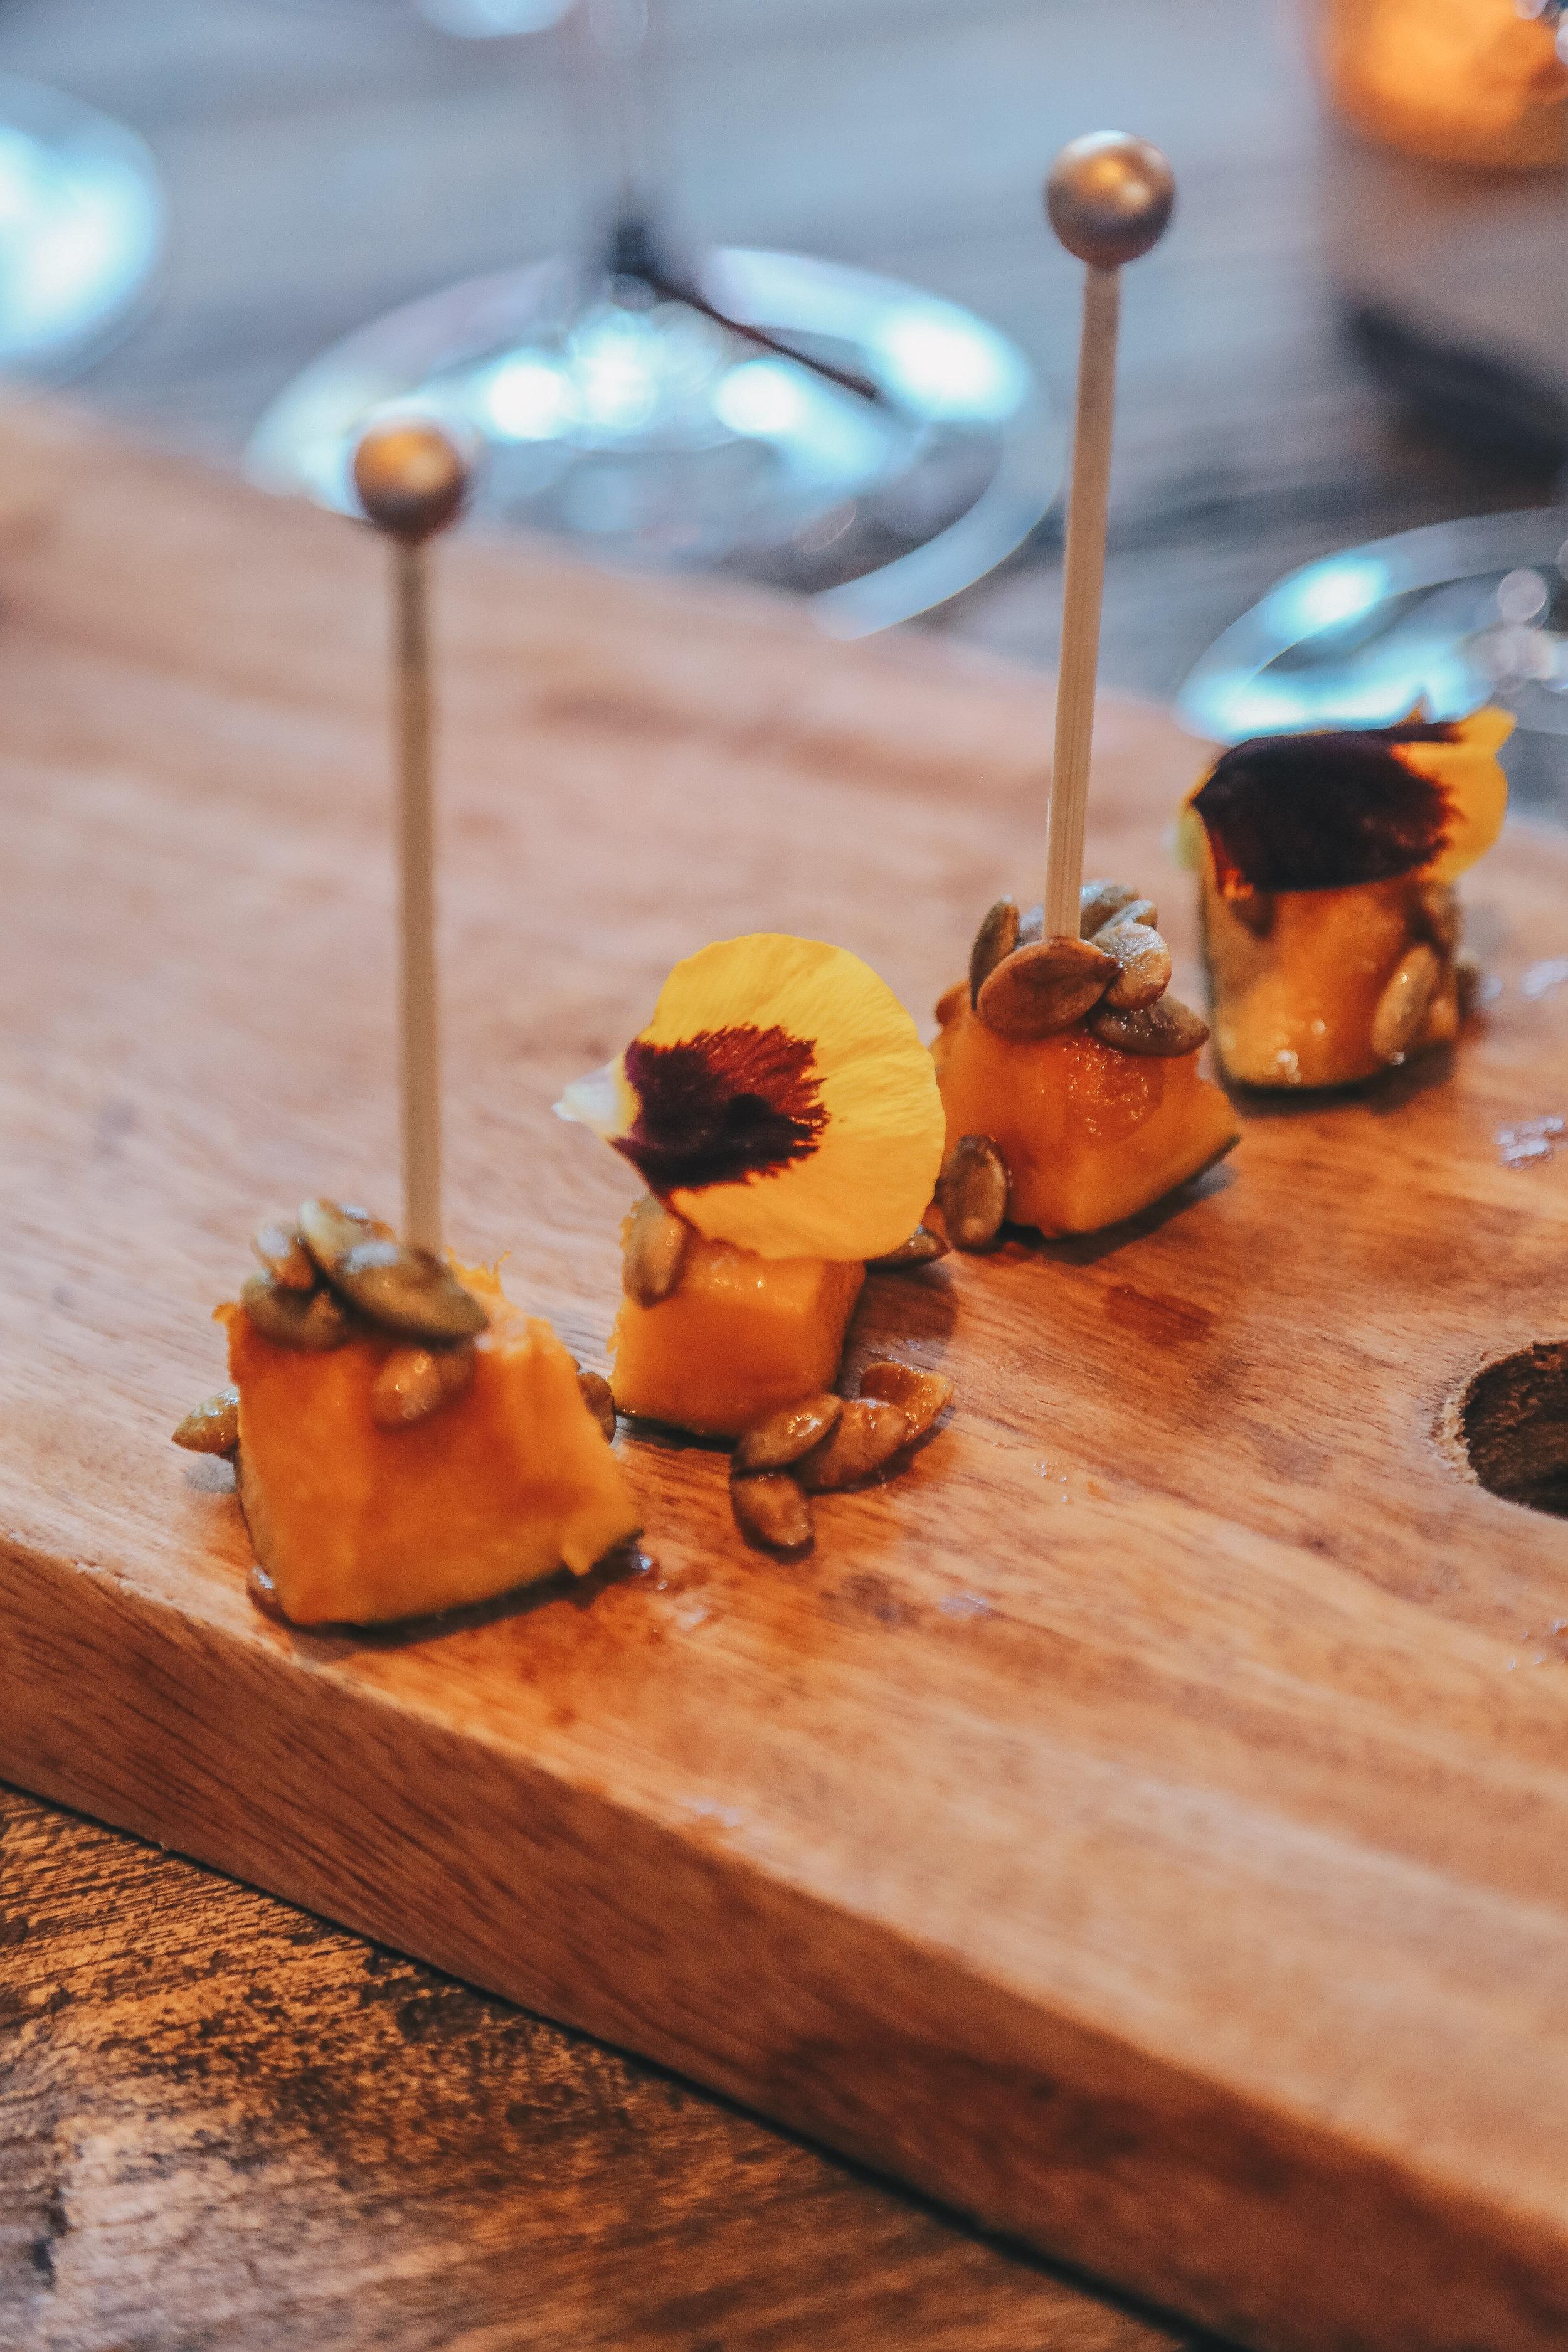 Roasted Kabocha Squash, Balsamic Glaze & Toasted Pepitas  (Part of the Seasons in Sonoma Tasting)